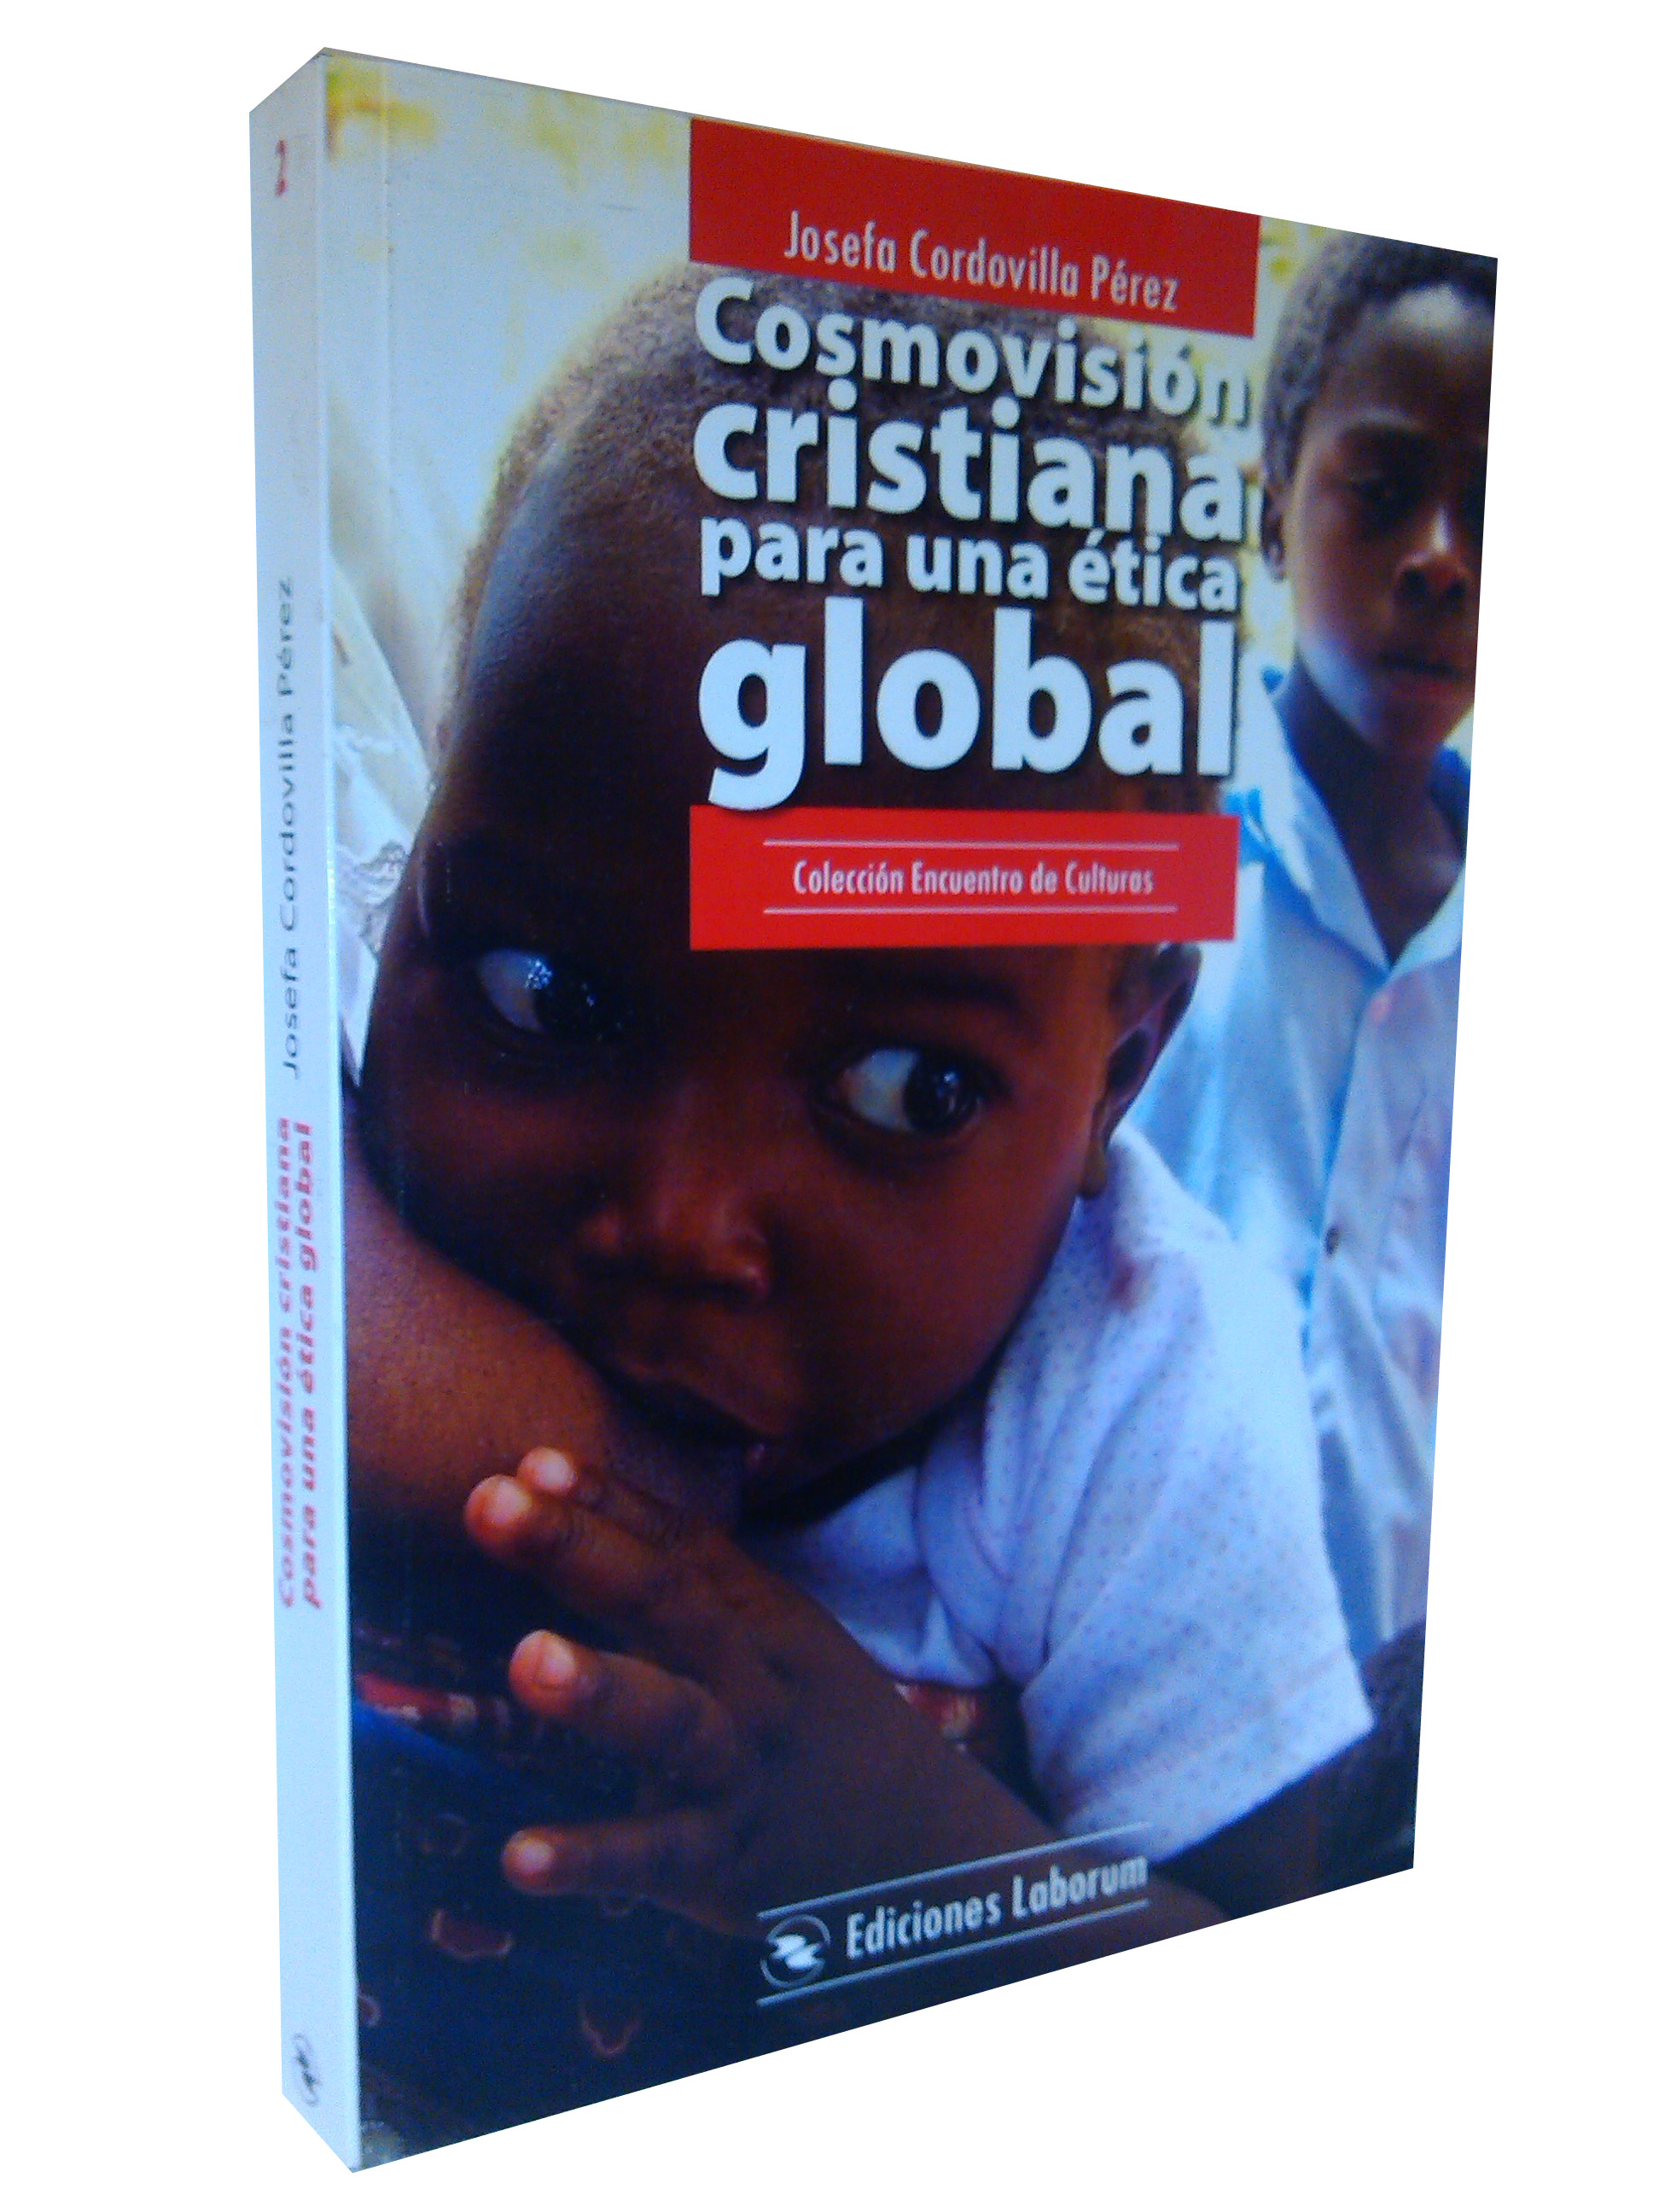 Cosmovisión cristiana para una ética global